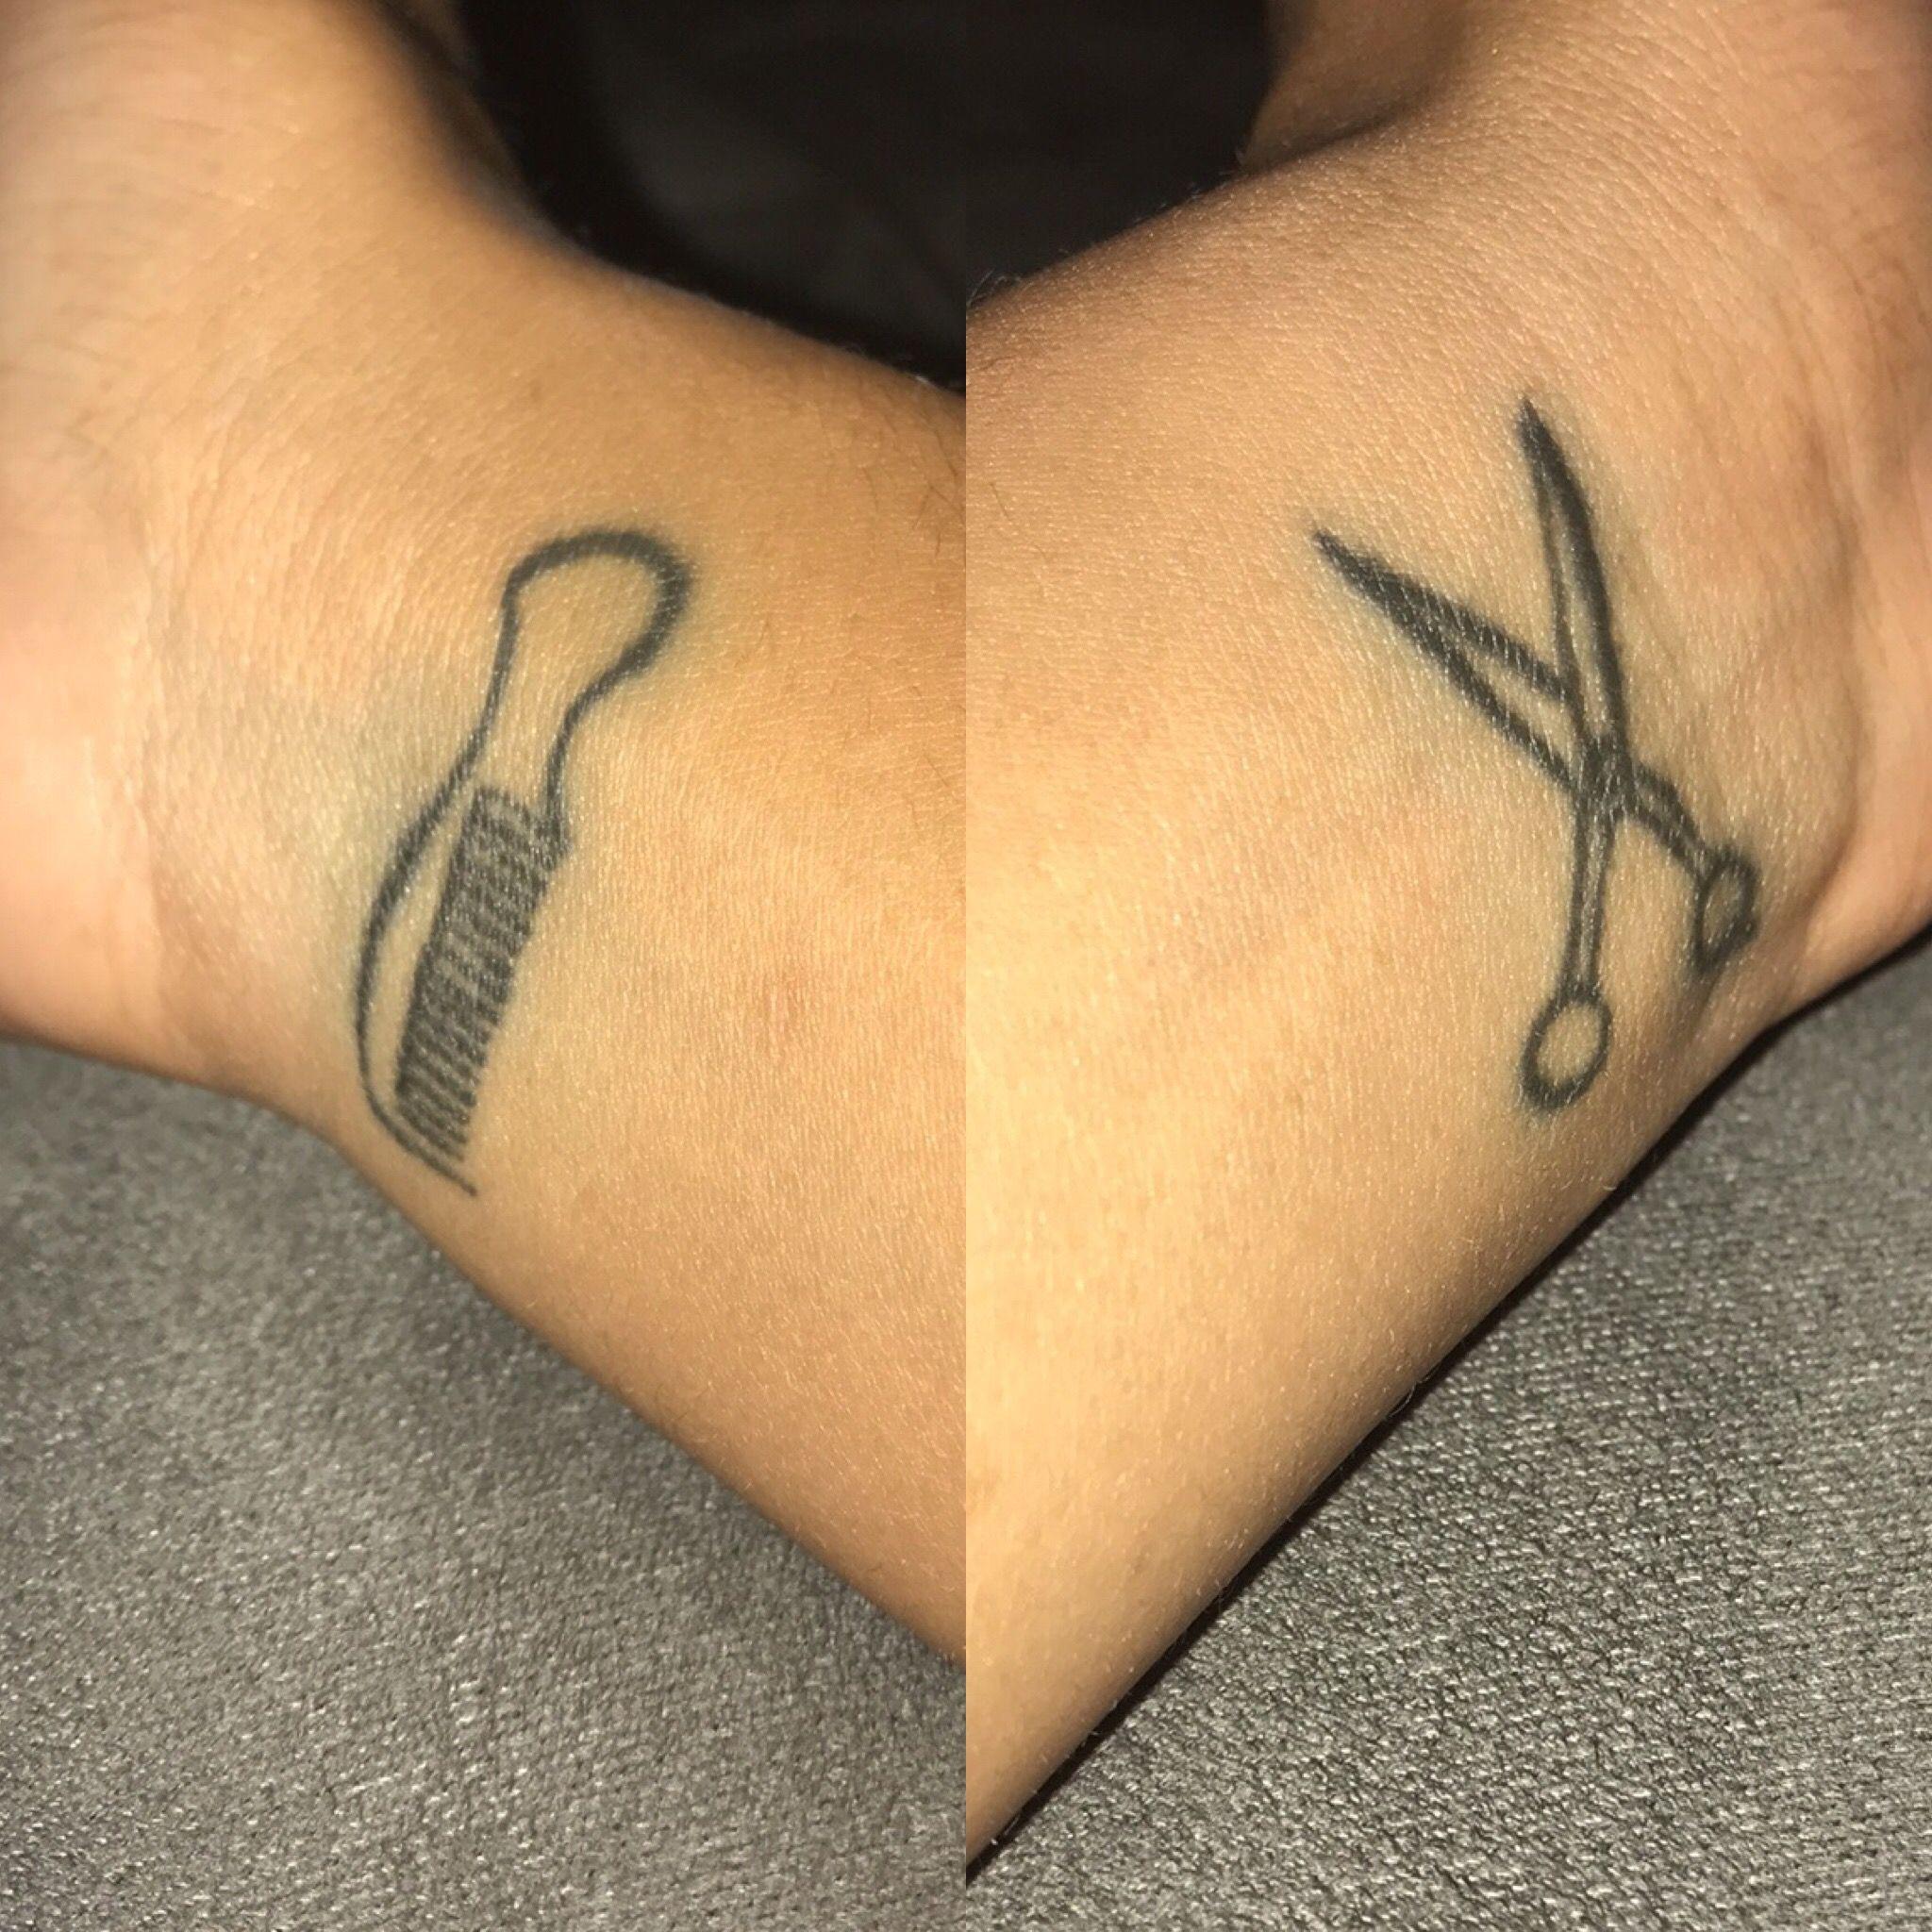 Navel piercing ideas  Pin by Amelia Glowacki on Tattoos Piercings u Other Rebeliousness